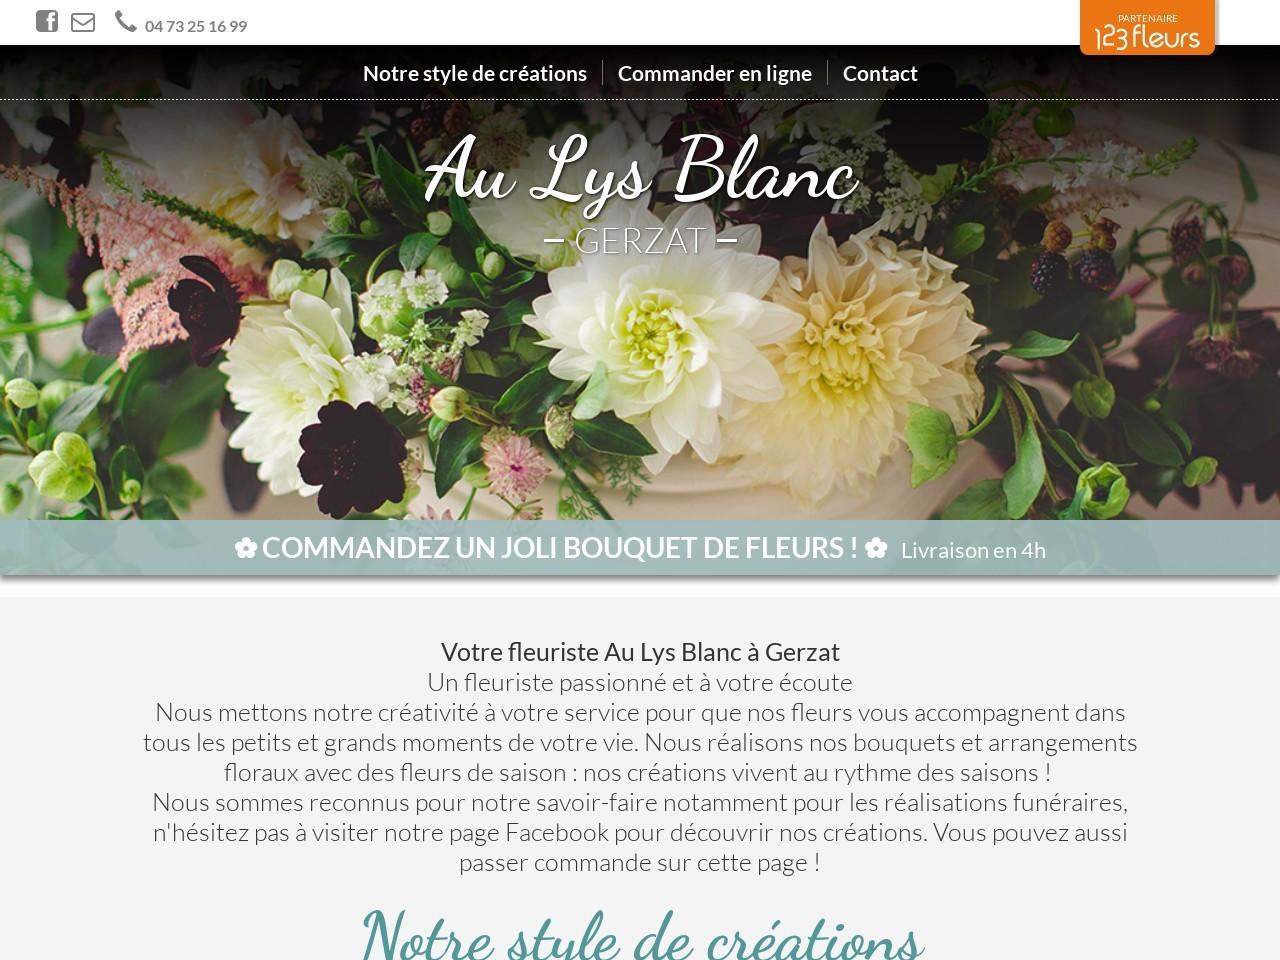 Site fleuriste Au Lys Blanc - 123fleurs